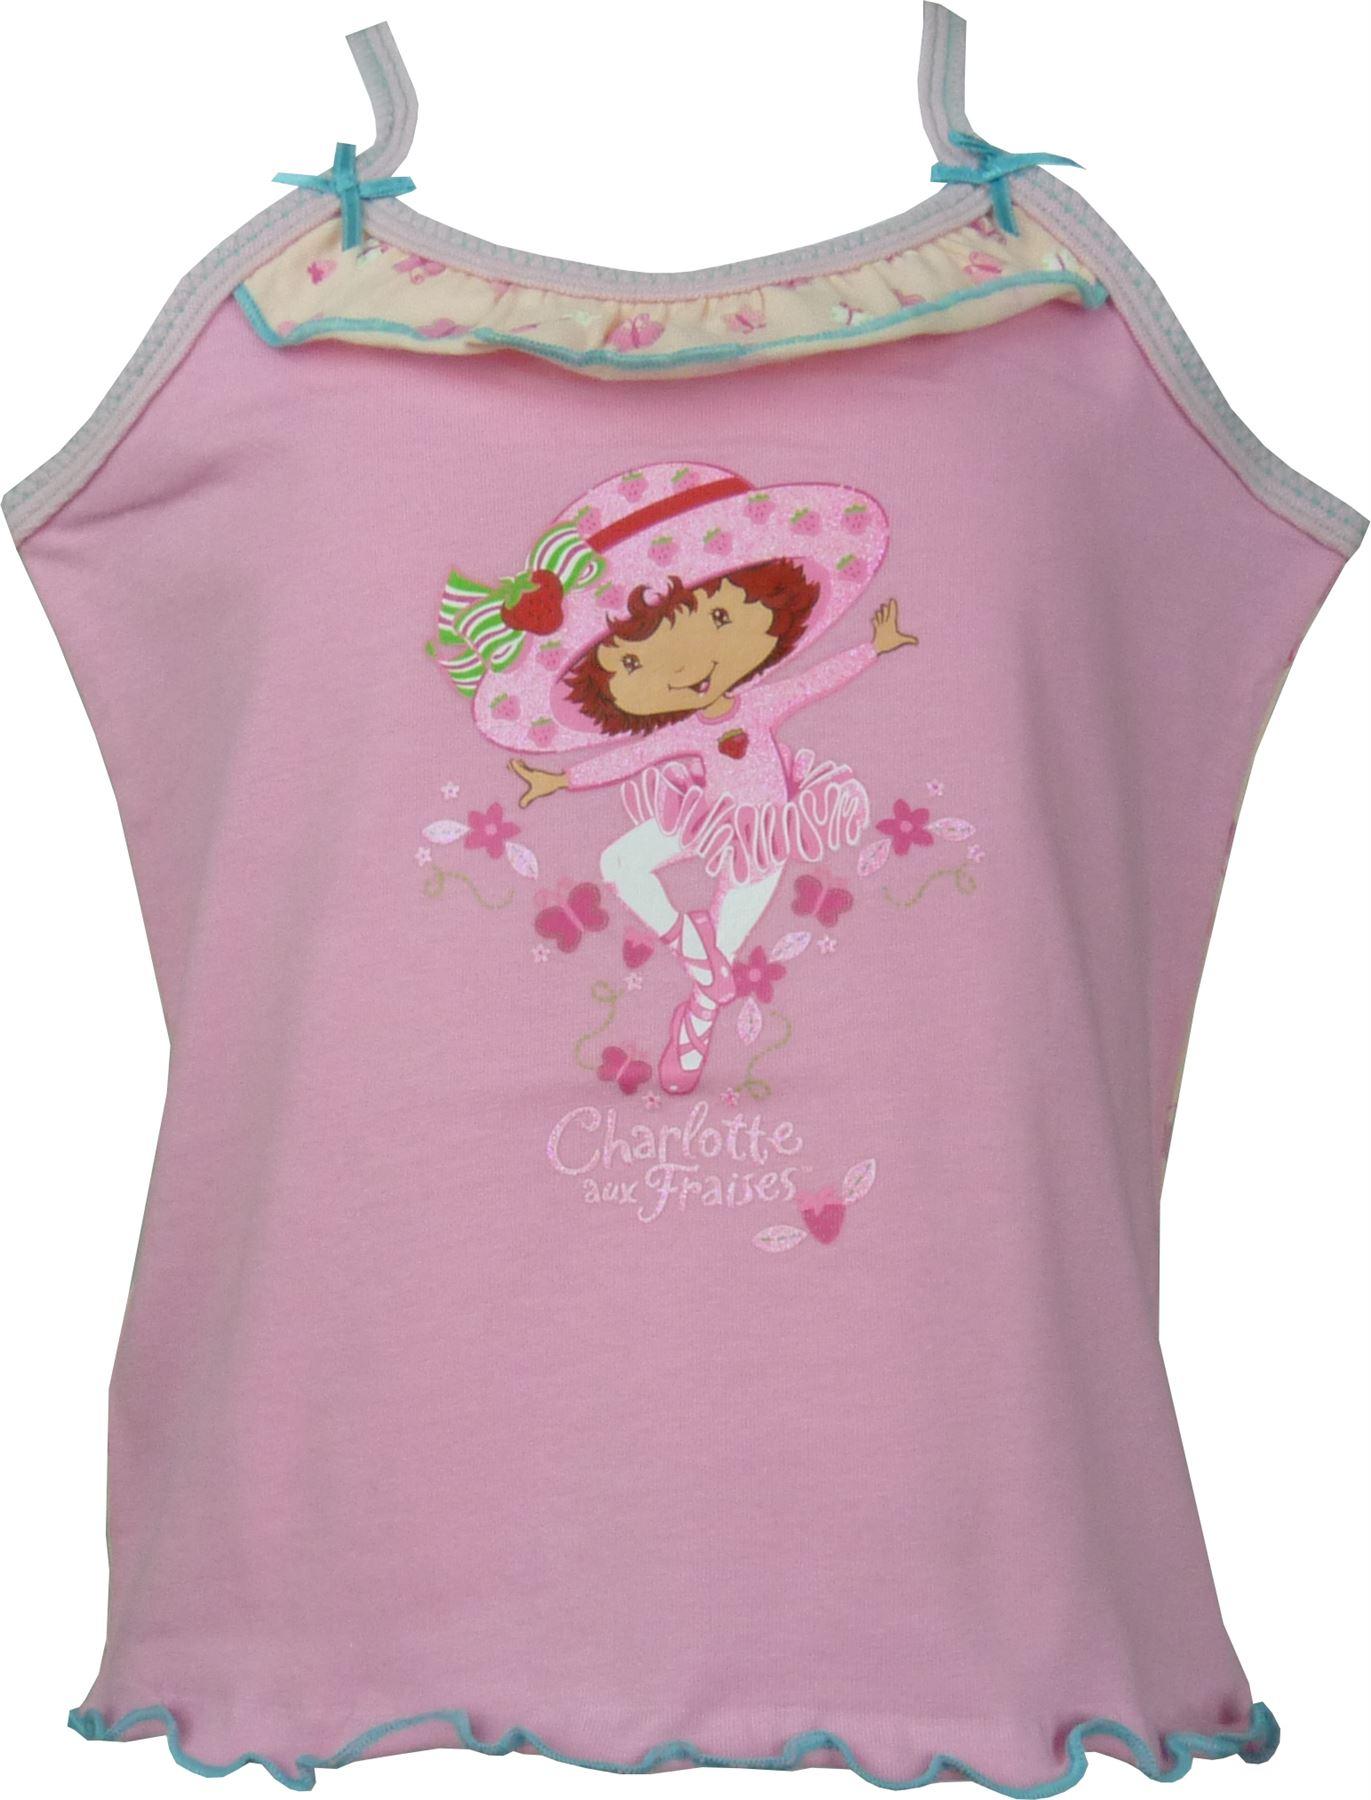 Ninas-Dora-Peppa-Pig-Hello-Kitty-Charlotte-aux-Fraises-manga-corta-camiseta